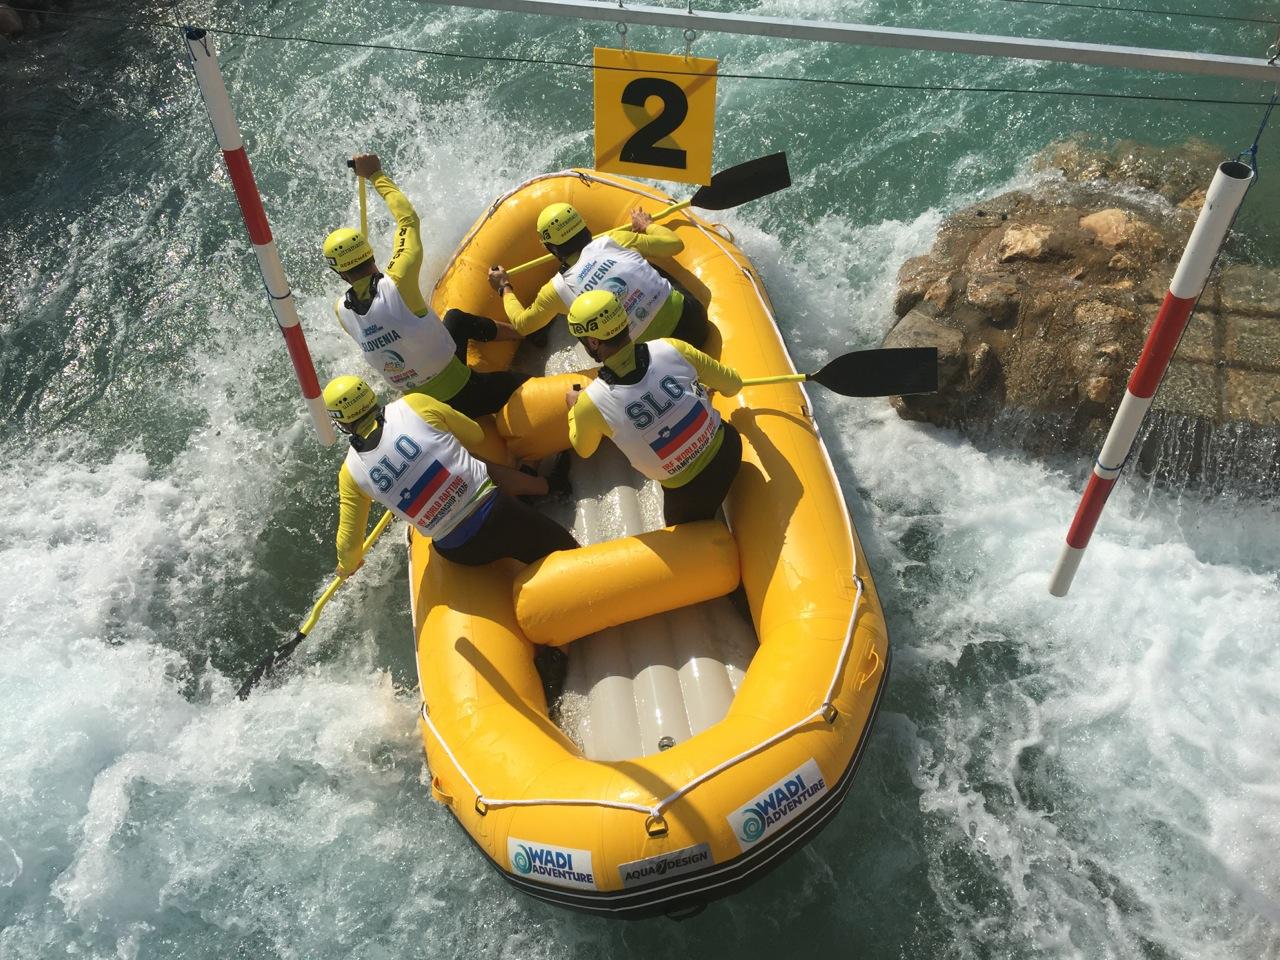 aquadesign-championnat-du-monde-rafting-2016-blog-4